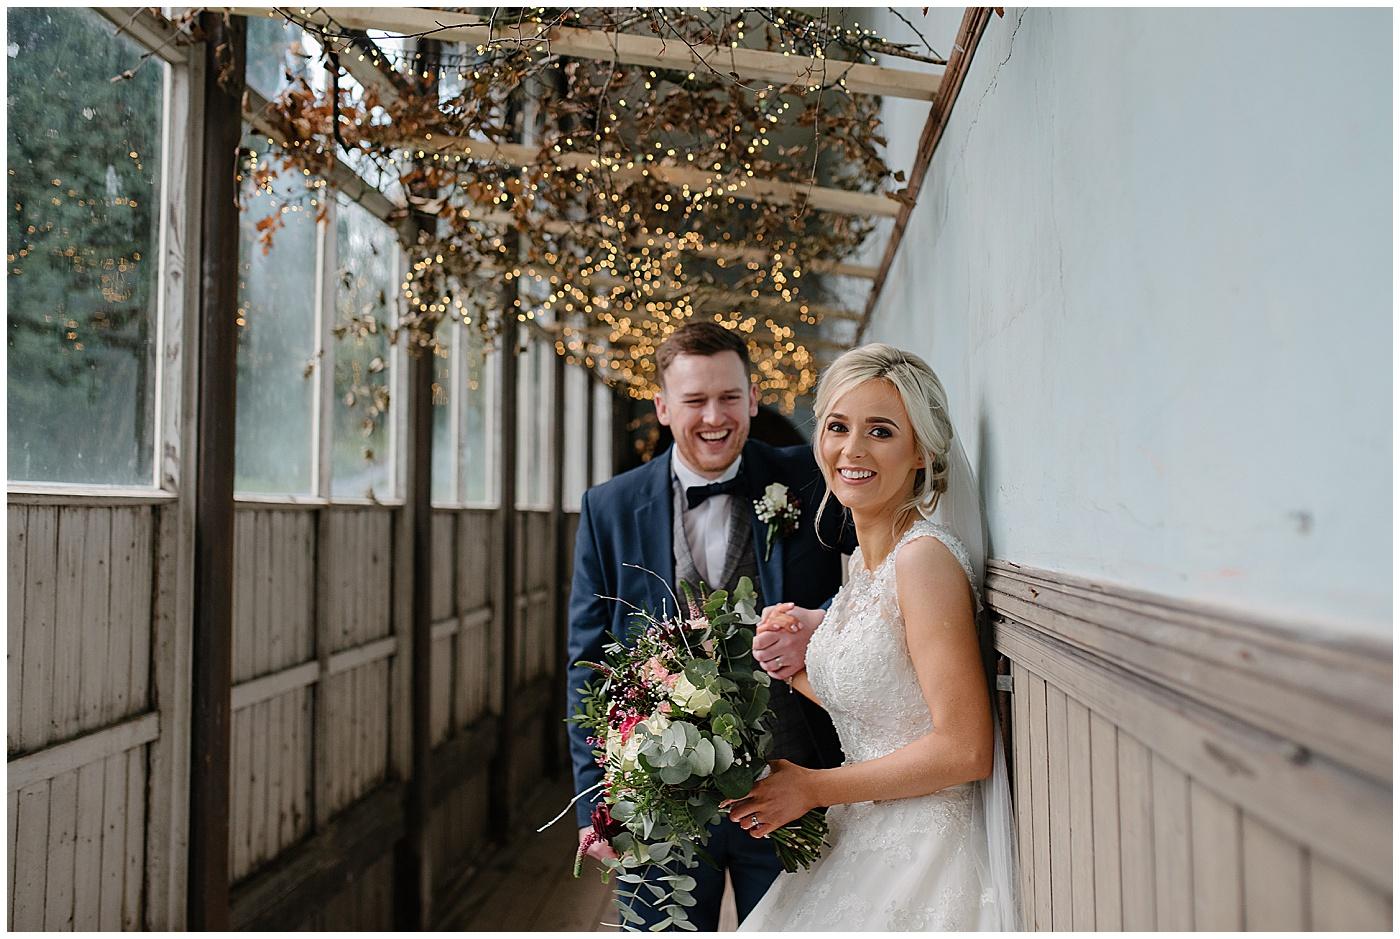 lissan-house-wedding-jude-browne-photography_0079.jpg